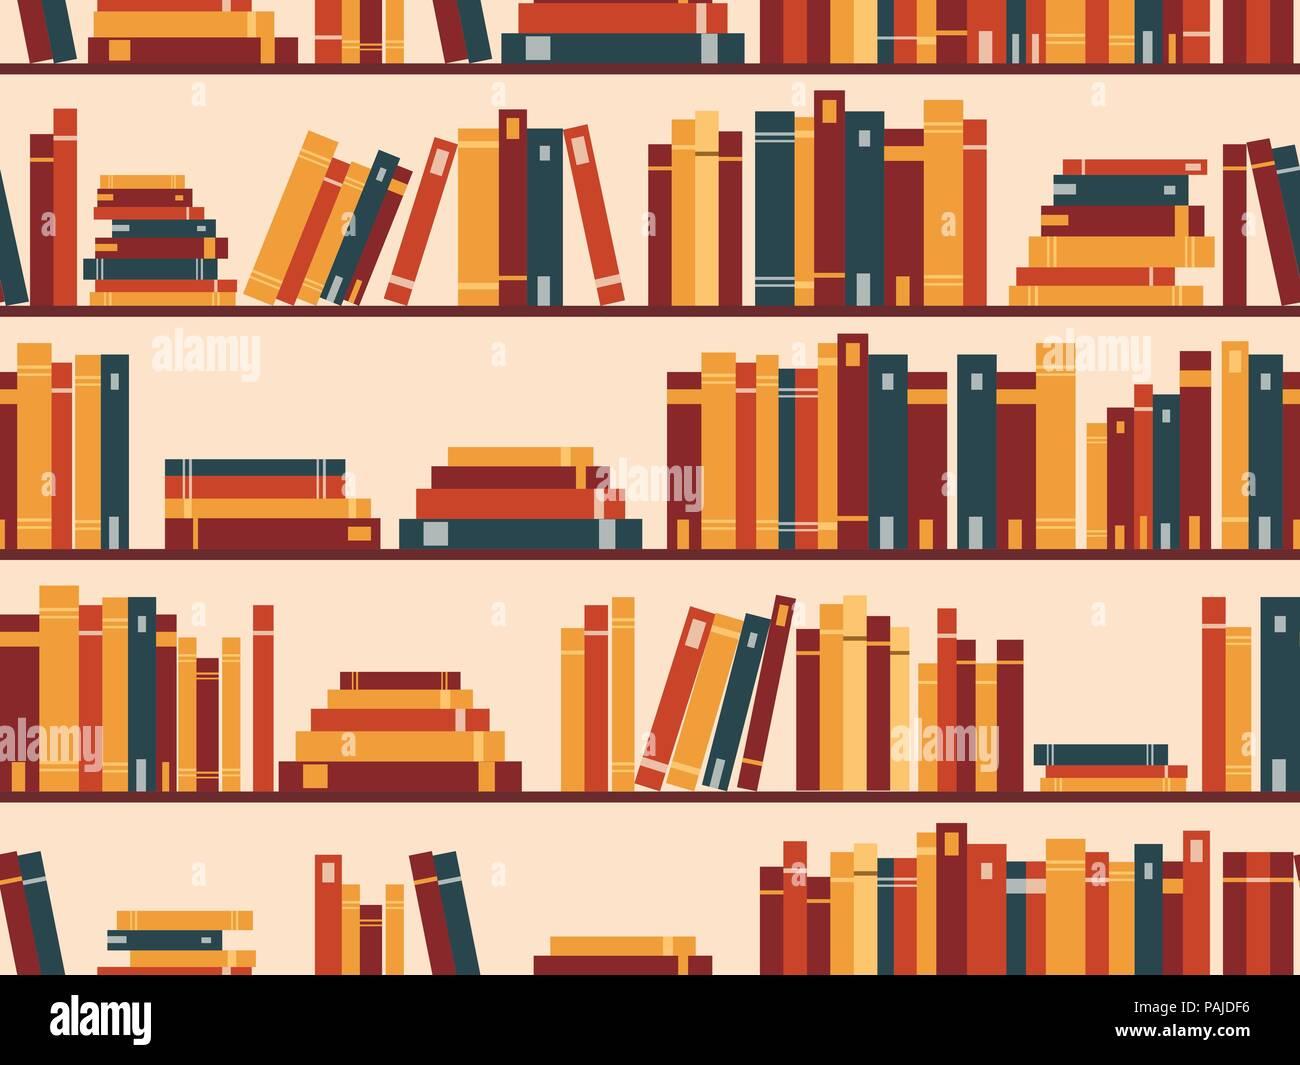 Seamless pattern with books, library bookshelf. Vector illustration - Stock Vector